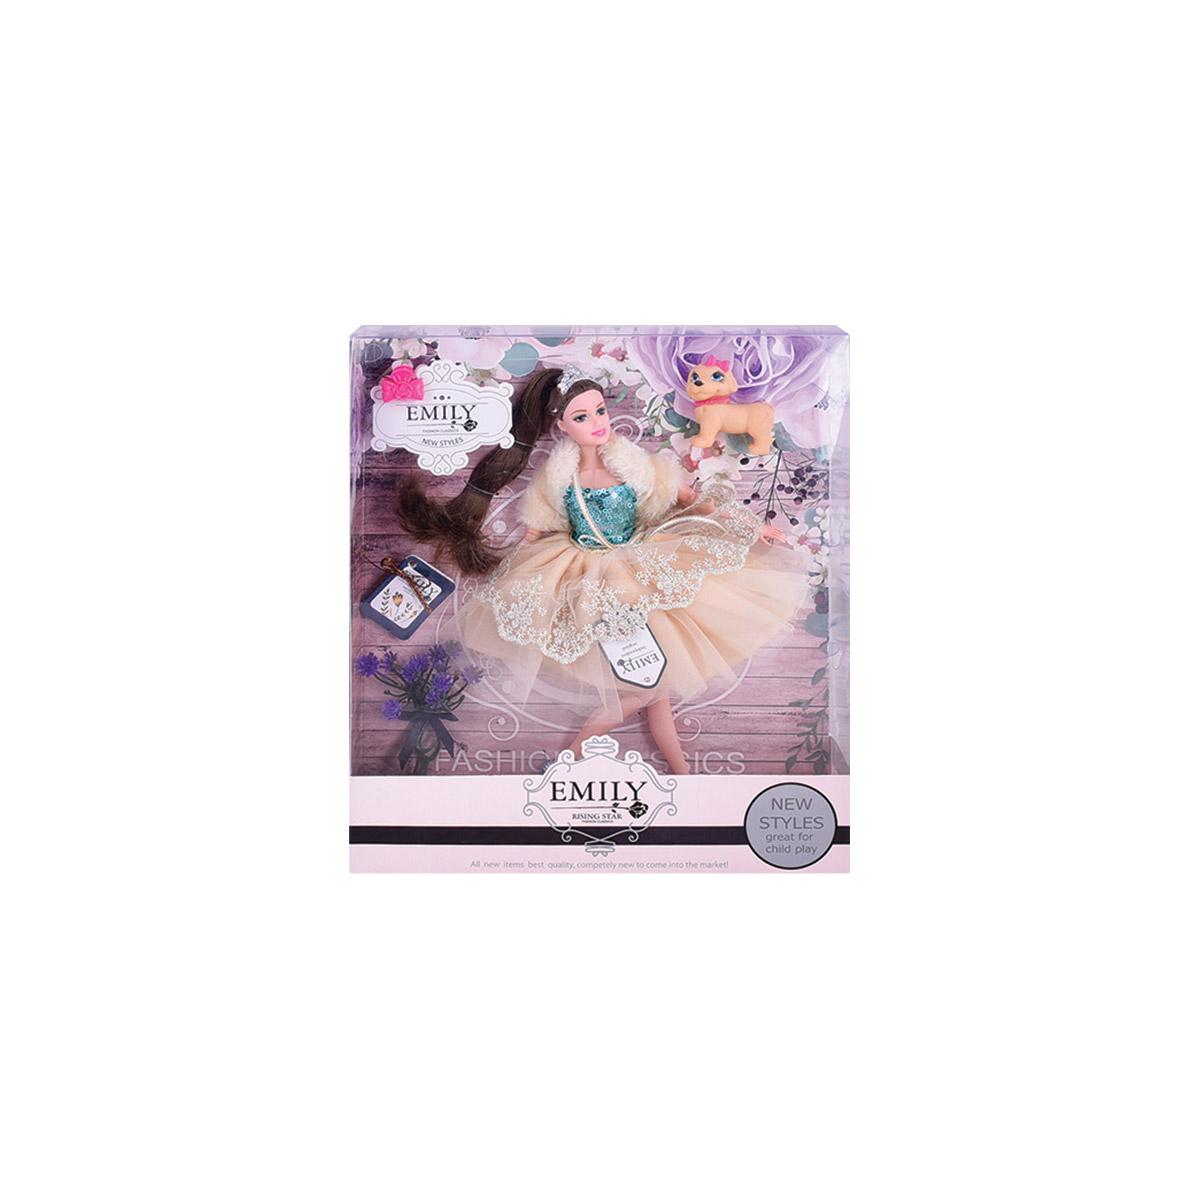 لعبة عروسة دمية للبنات موديل QJ079A / QJ079C